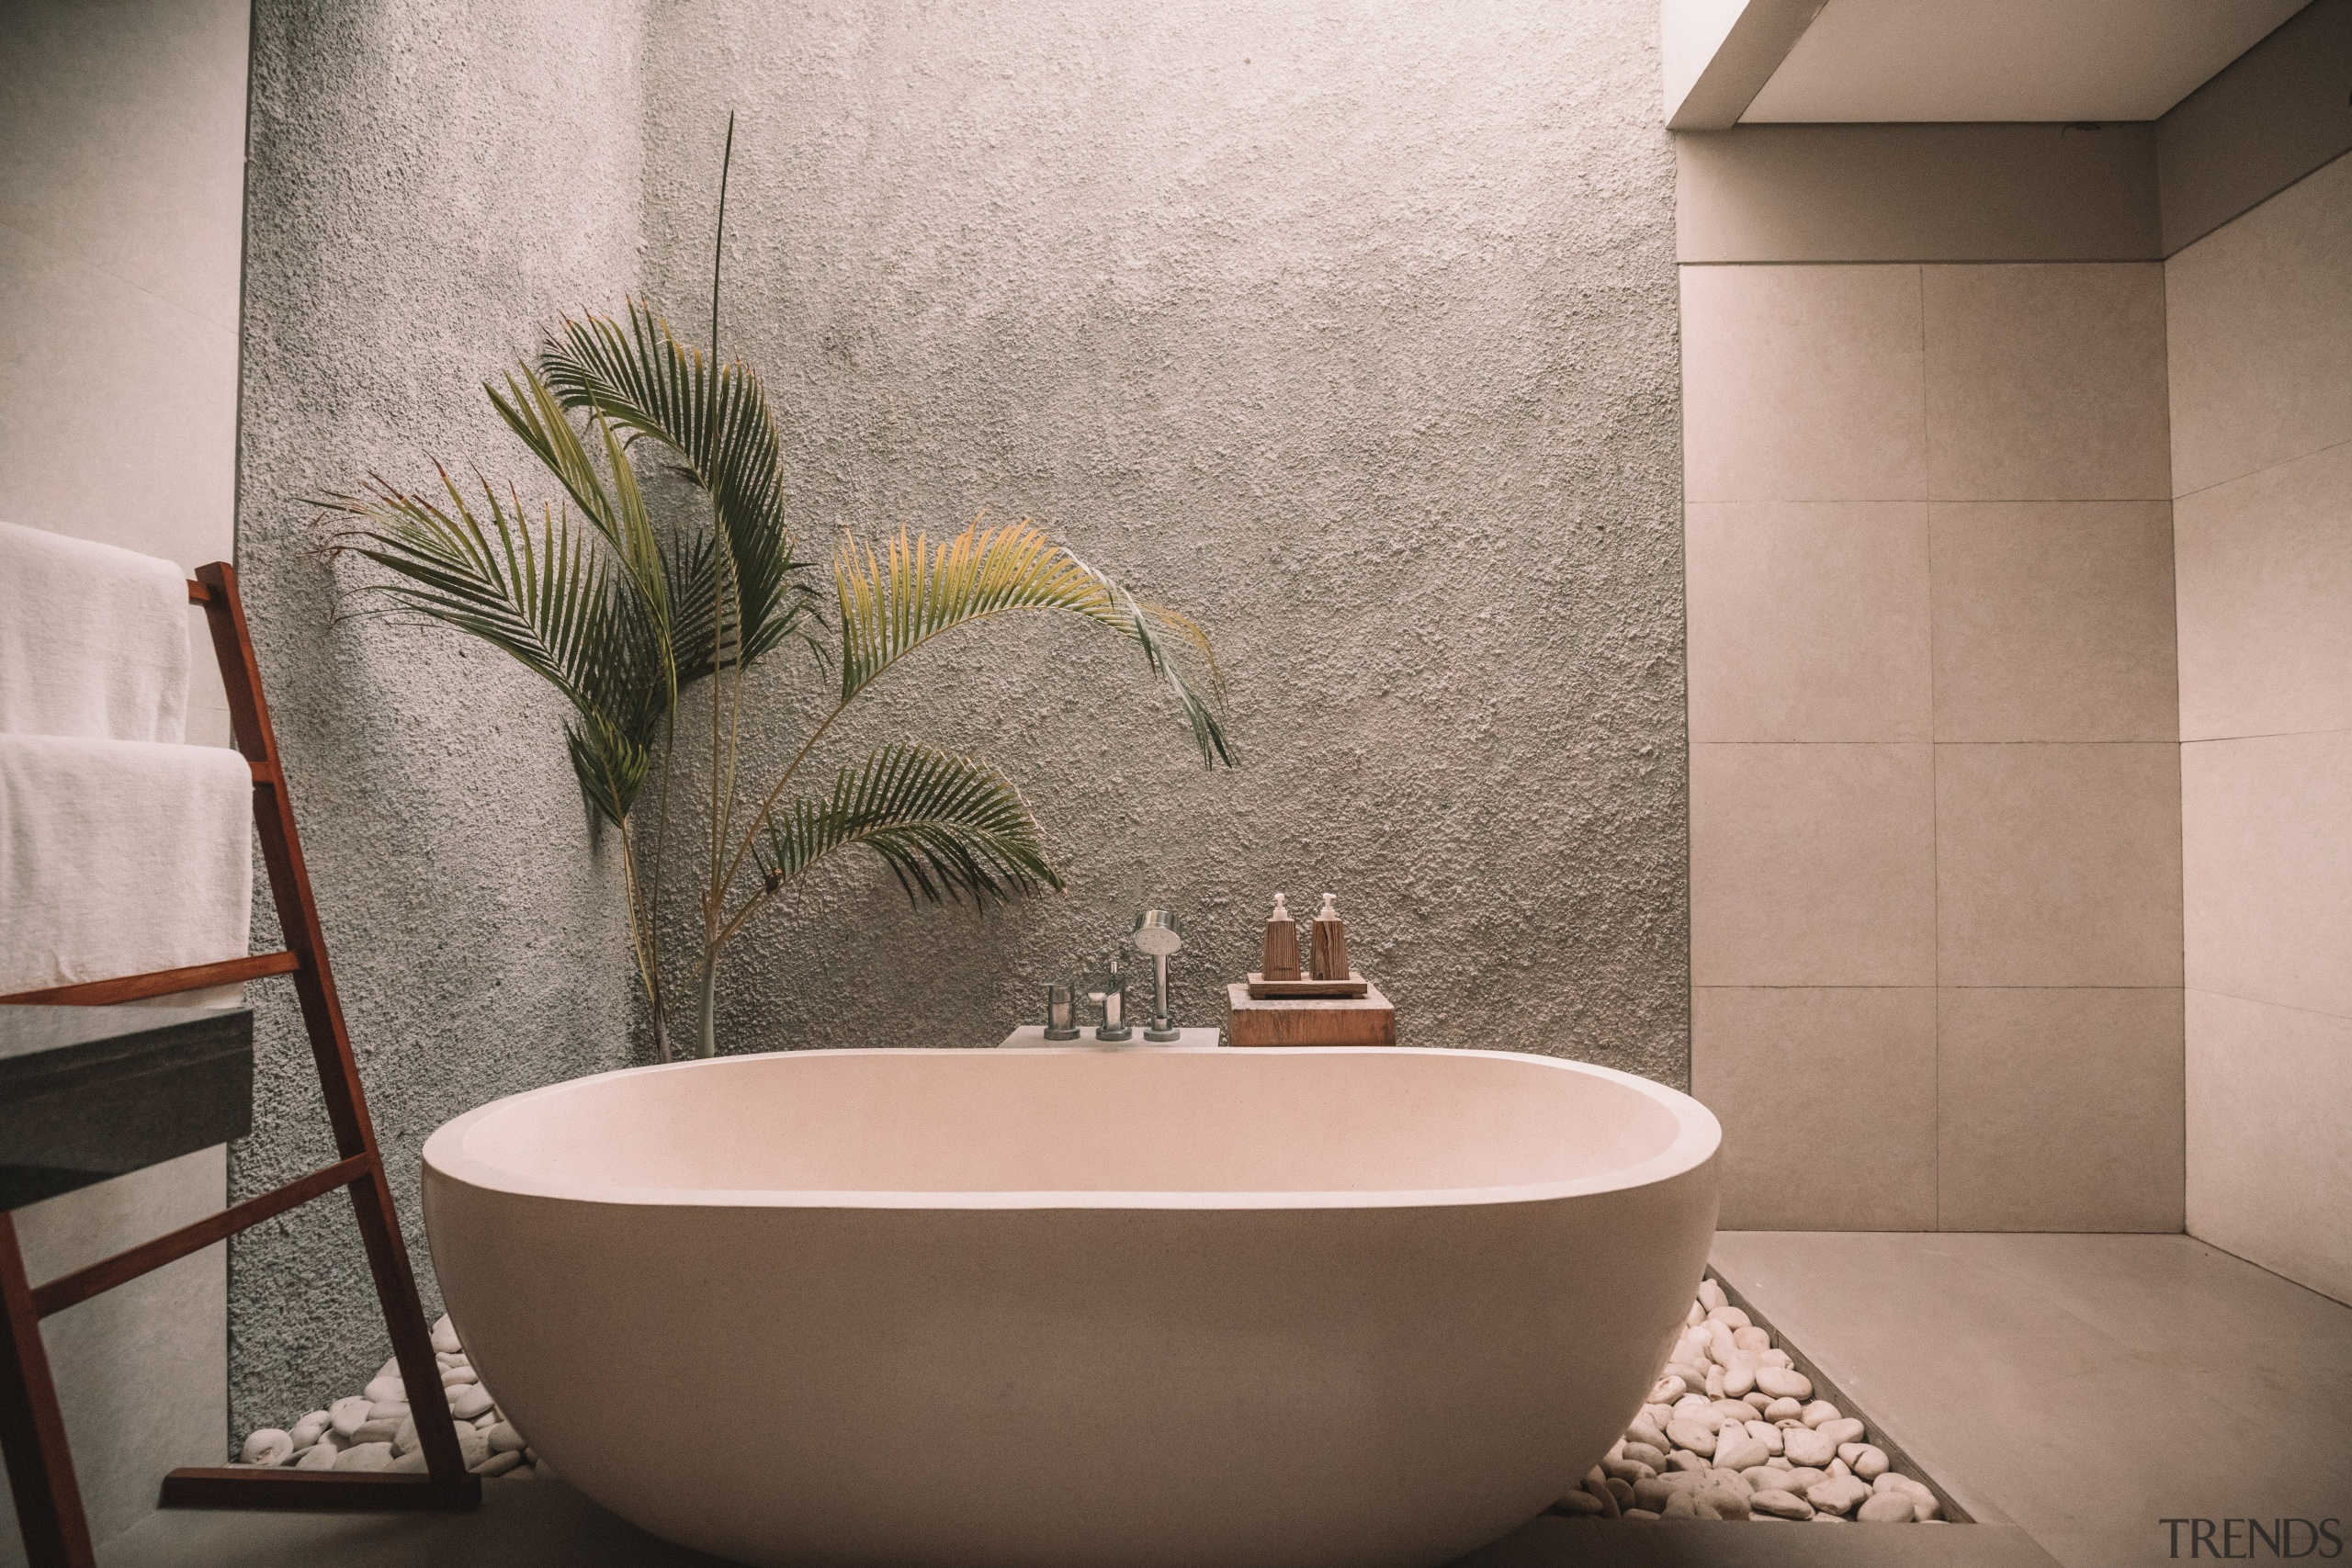 Modern plumbing options – including floor-mounted tapware –